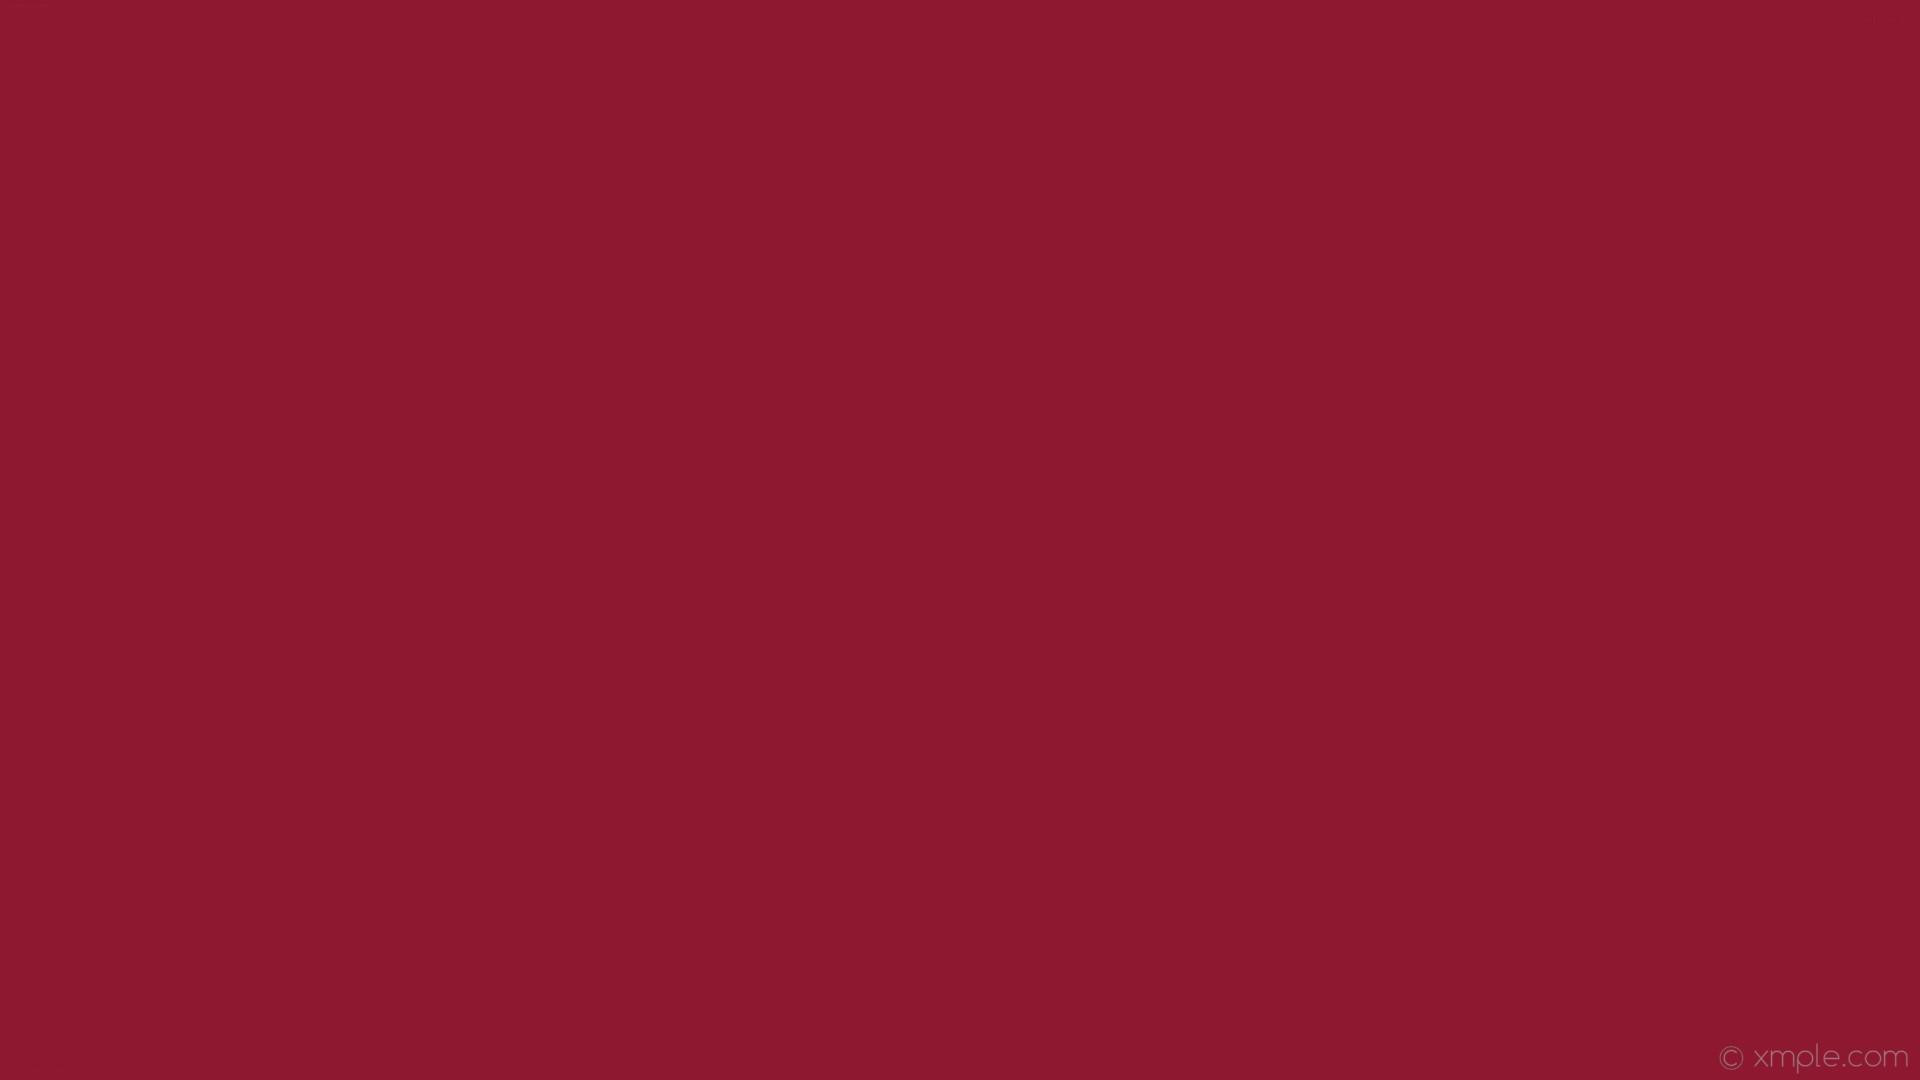 wallpaper single plain red one colour solid color #8d1830